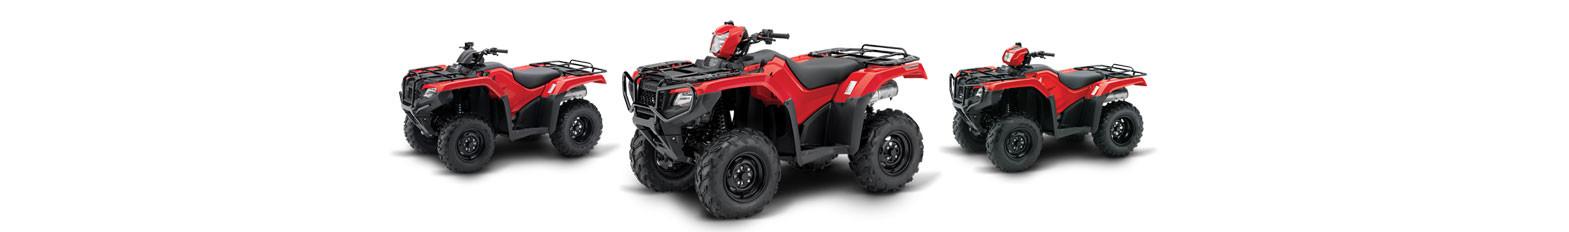 ATV range